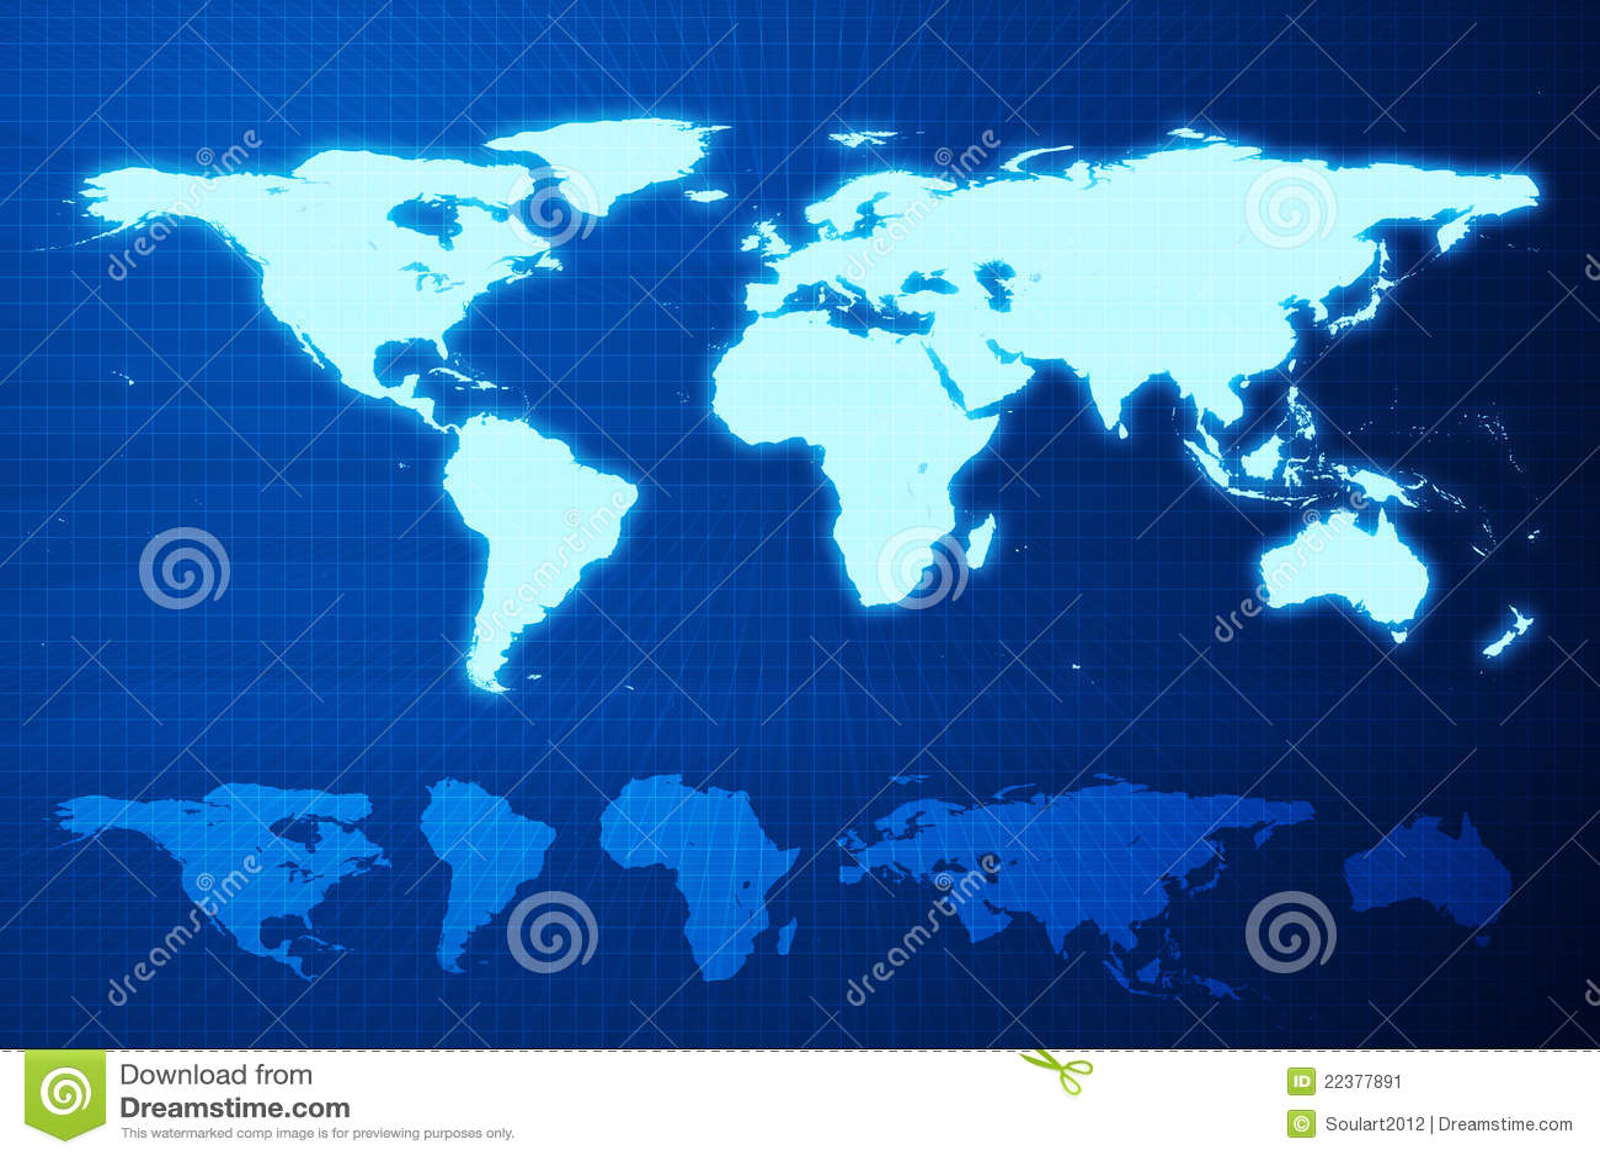 World map and mainland